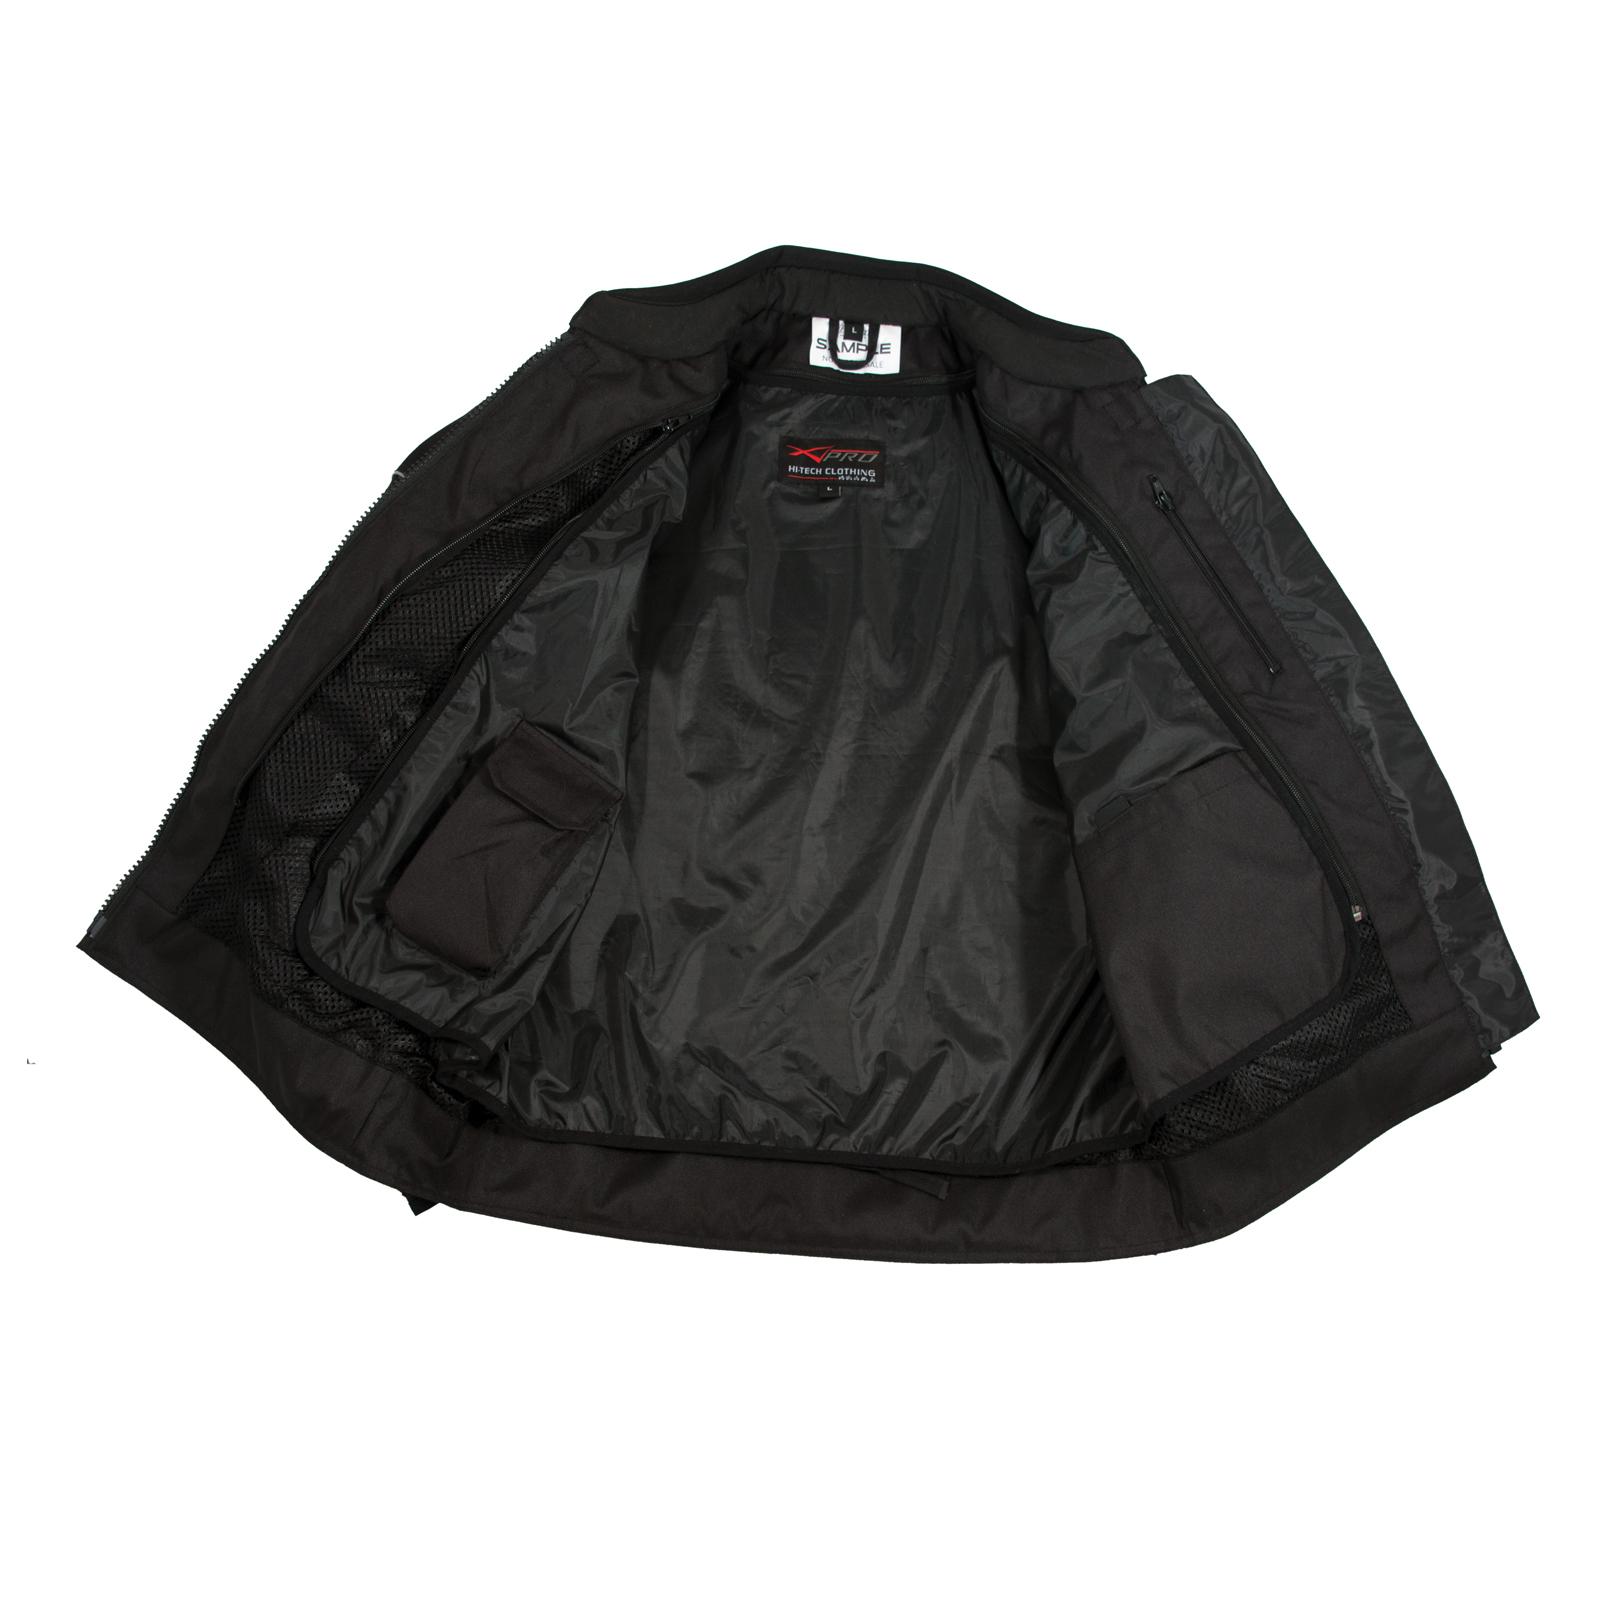 Donna-Giacca-Moto-Tessuto-Impermeabile-Traspirante-Riflettente-Bianco